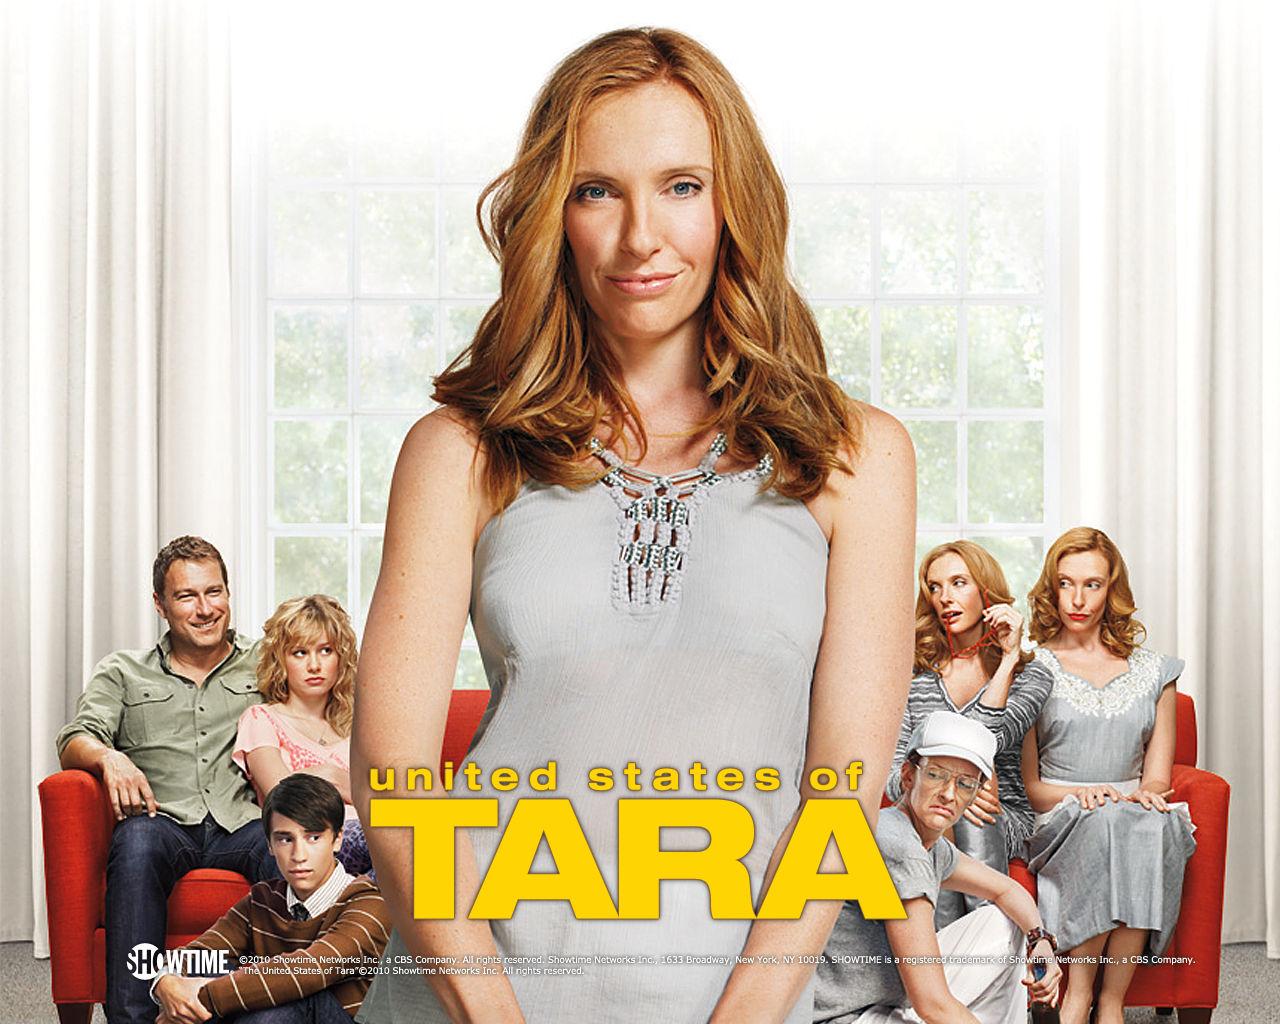 Tara united states